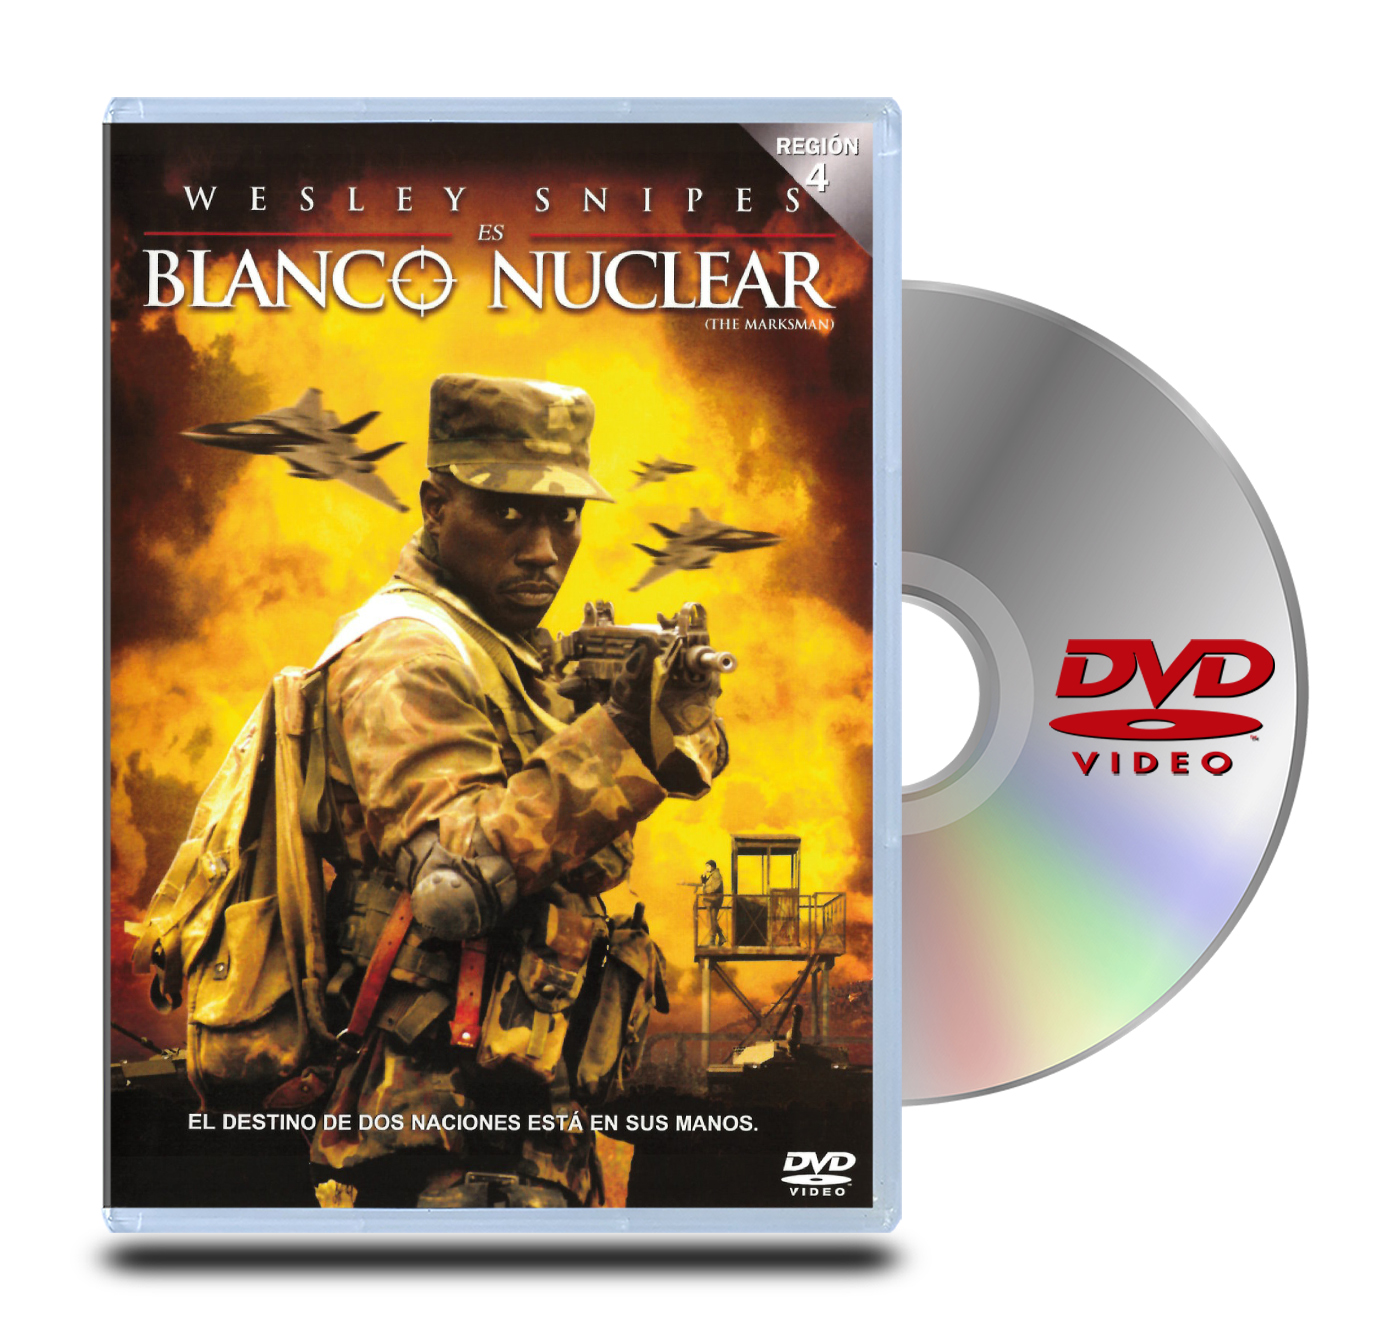 DVD Blanco Nuclear